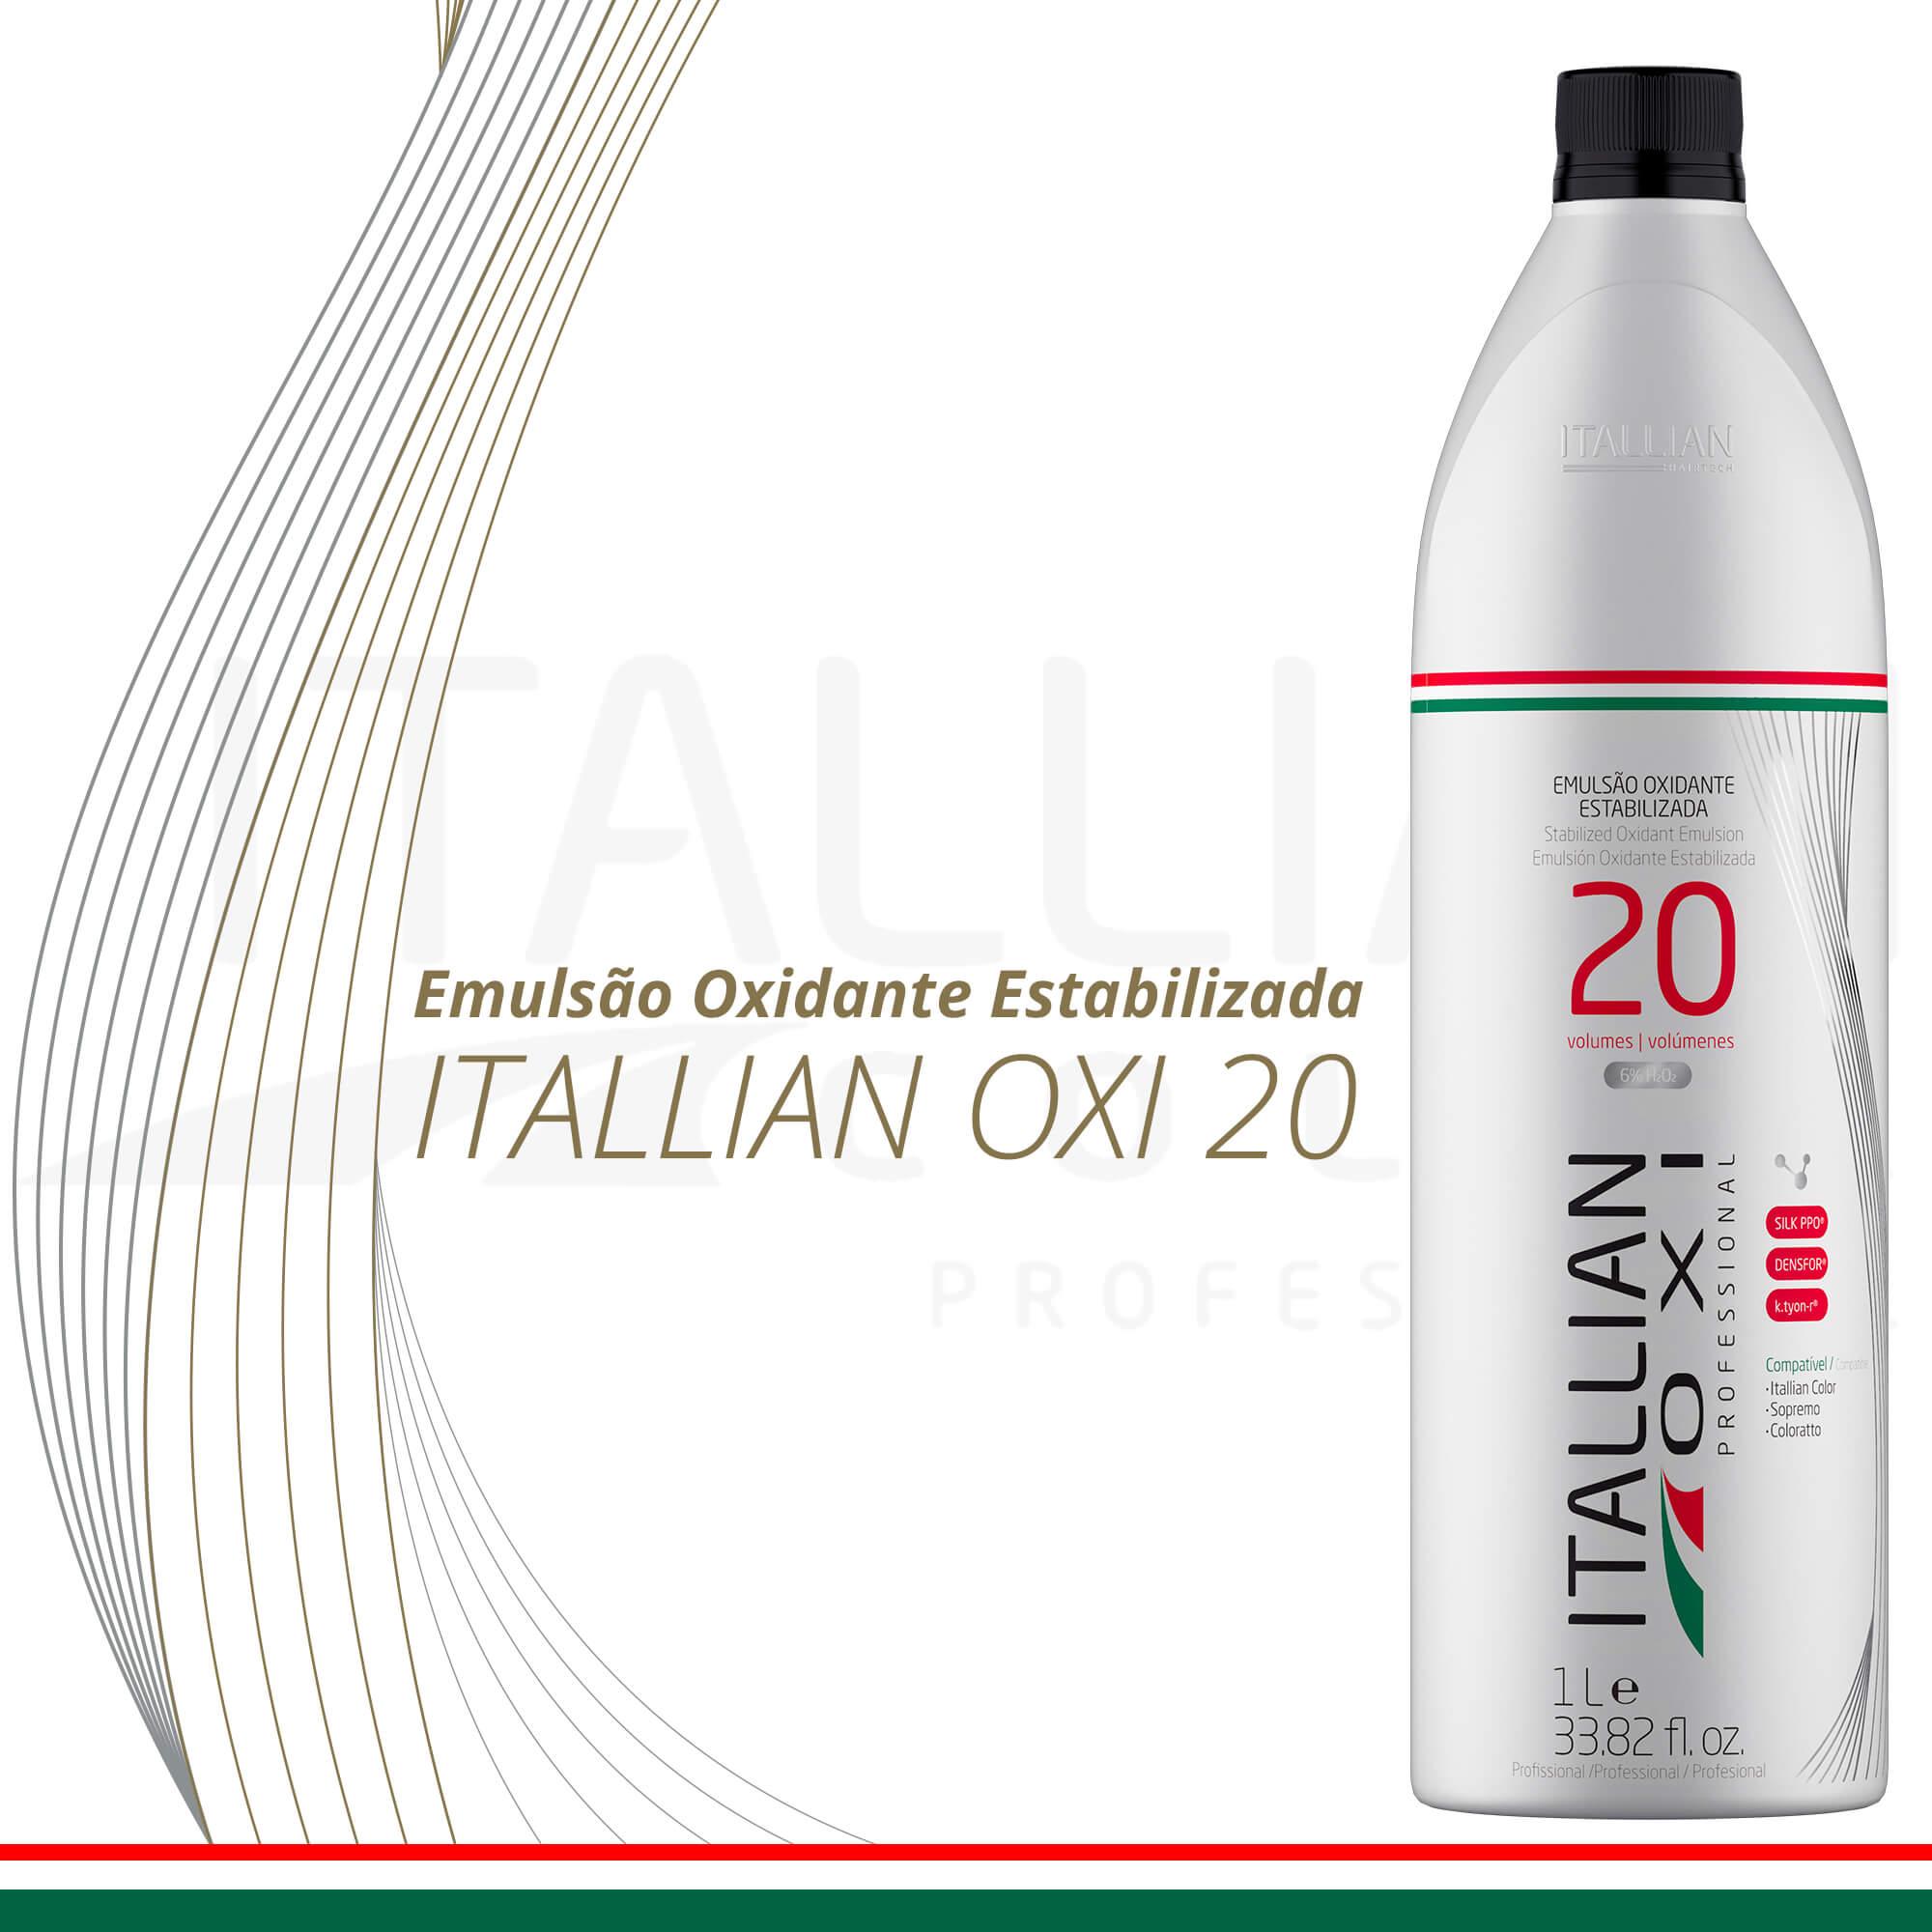 Emulsão Oxidante Estabilizada Itallian Oxi 20 Volumes 1l